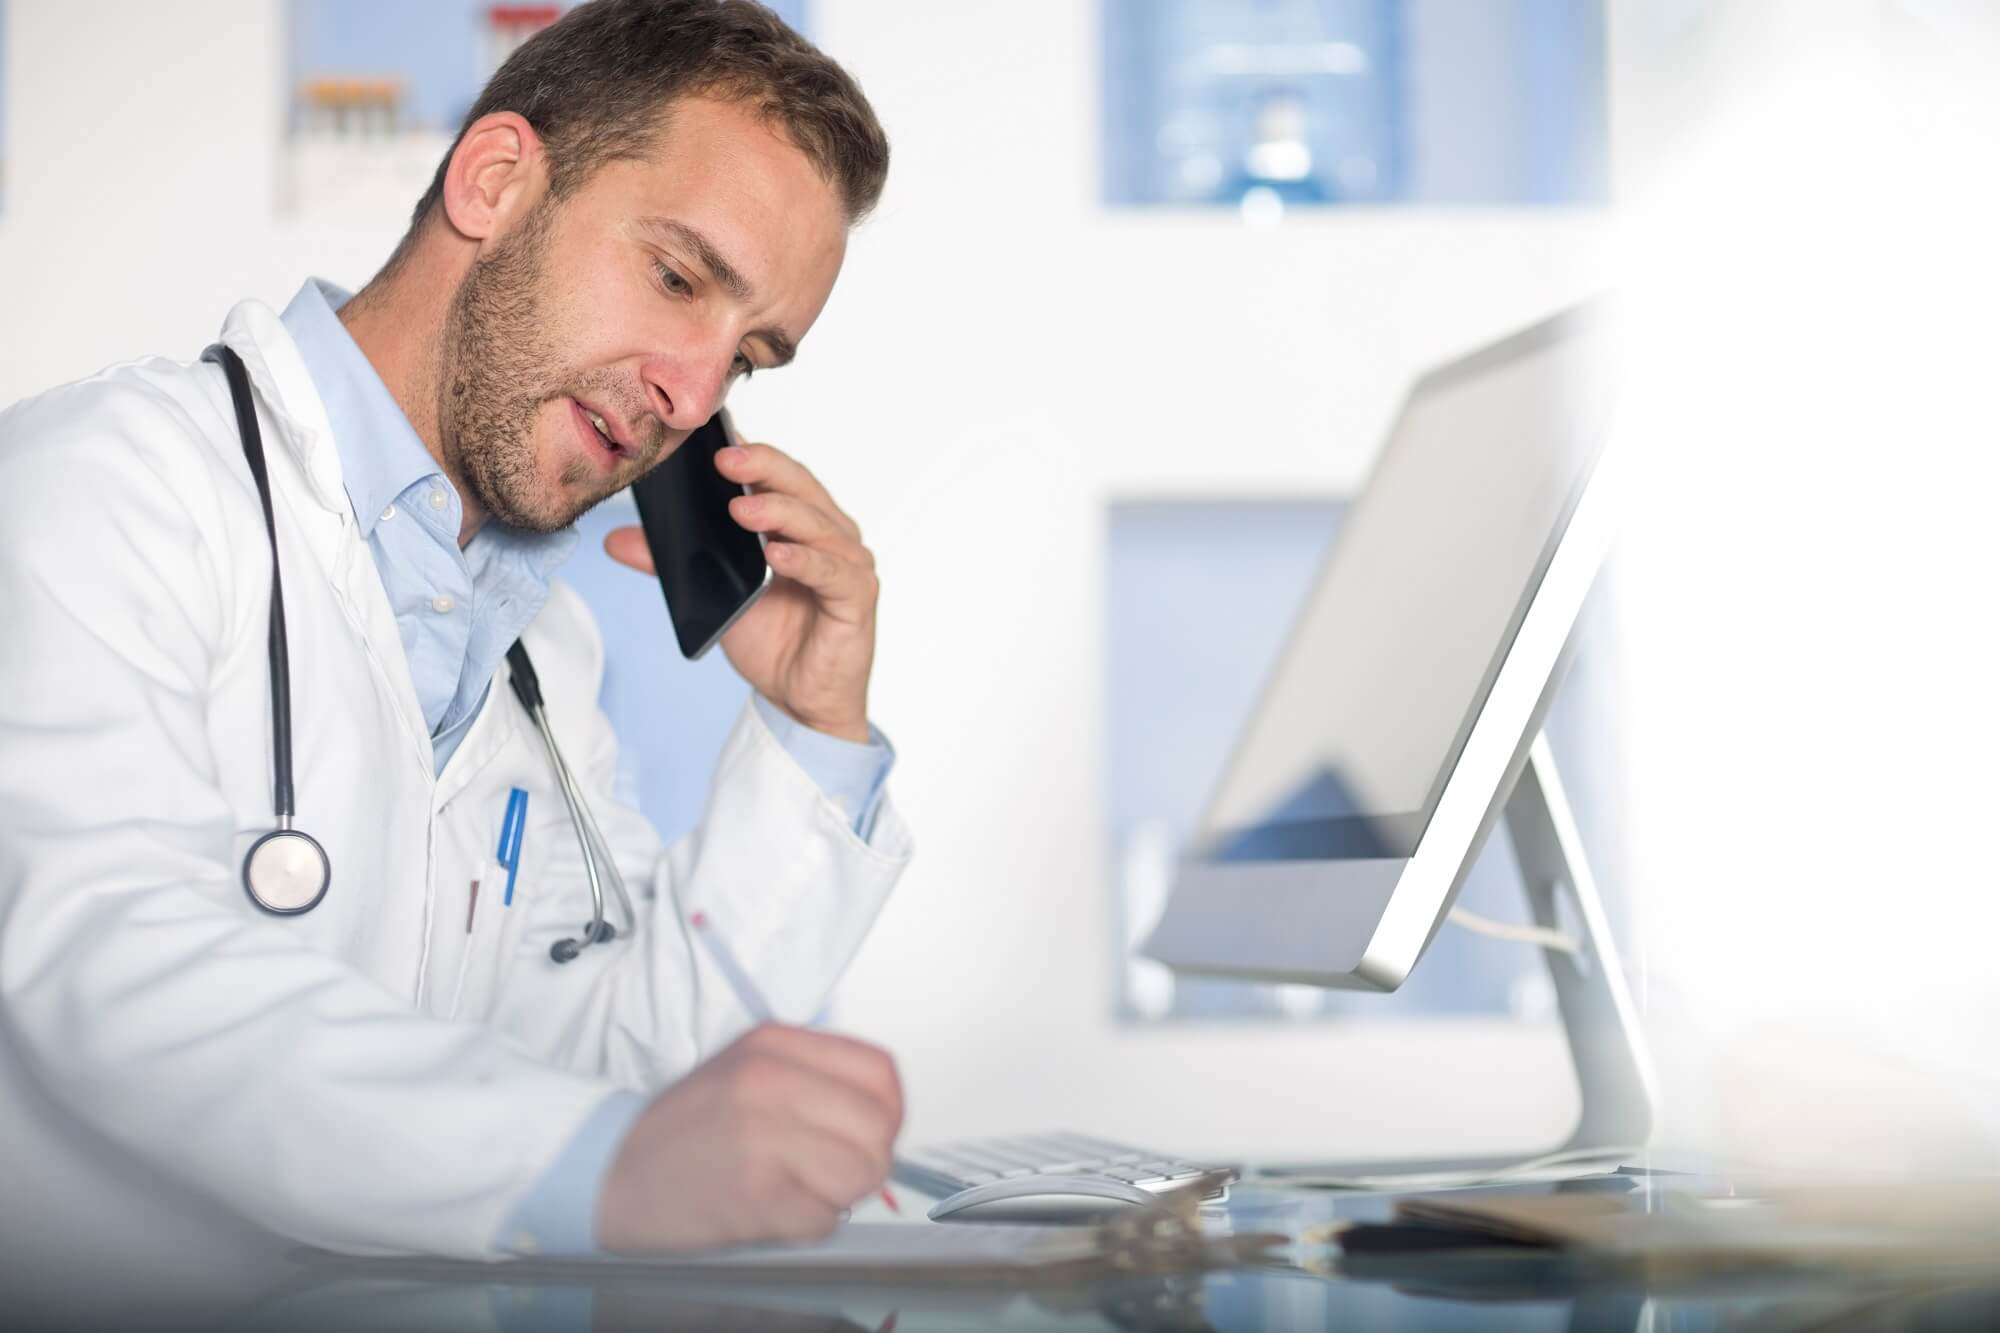 врач говорит по телефону